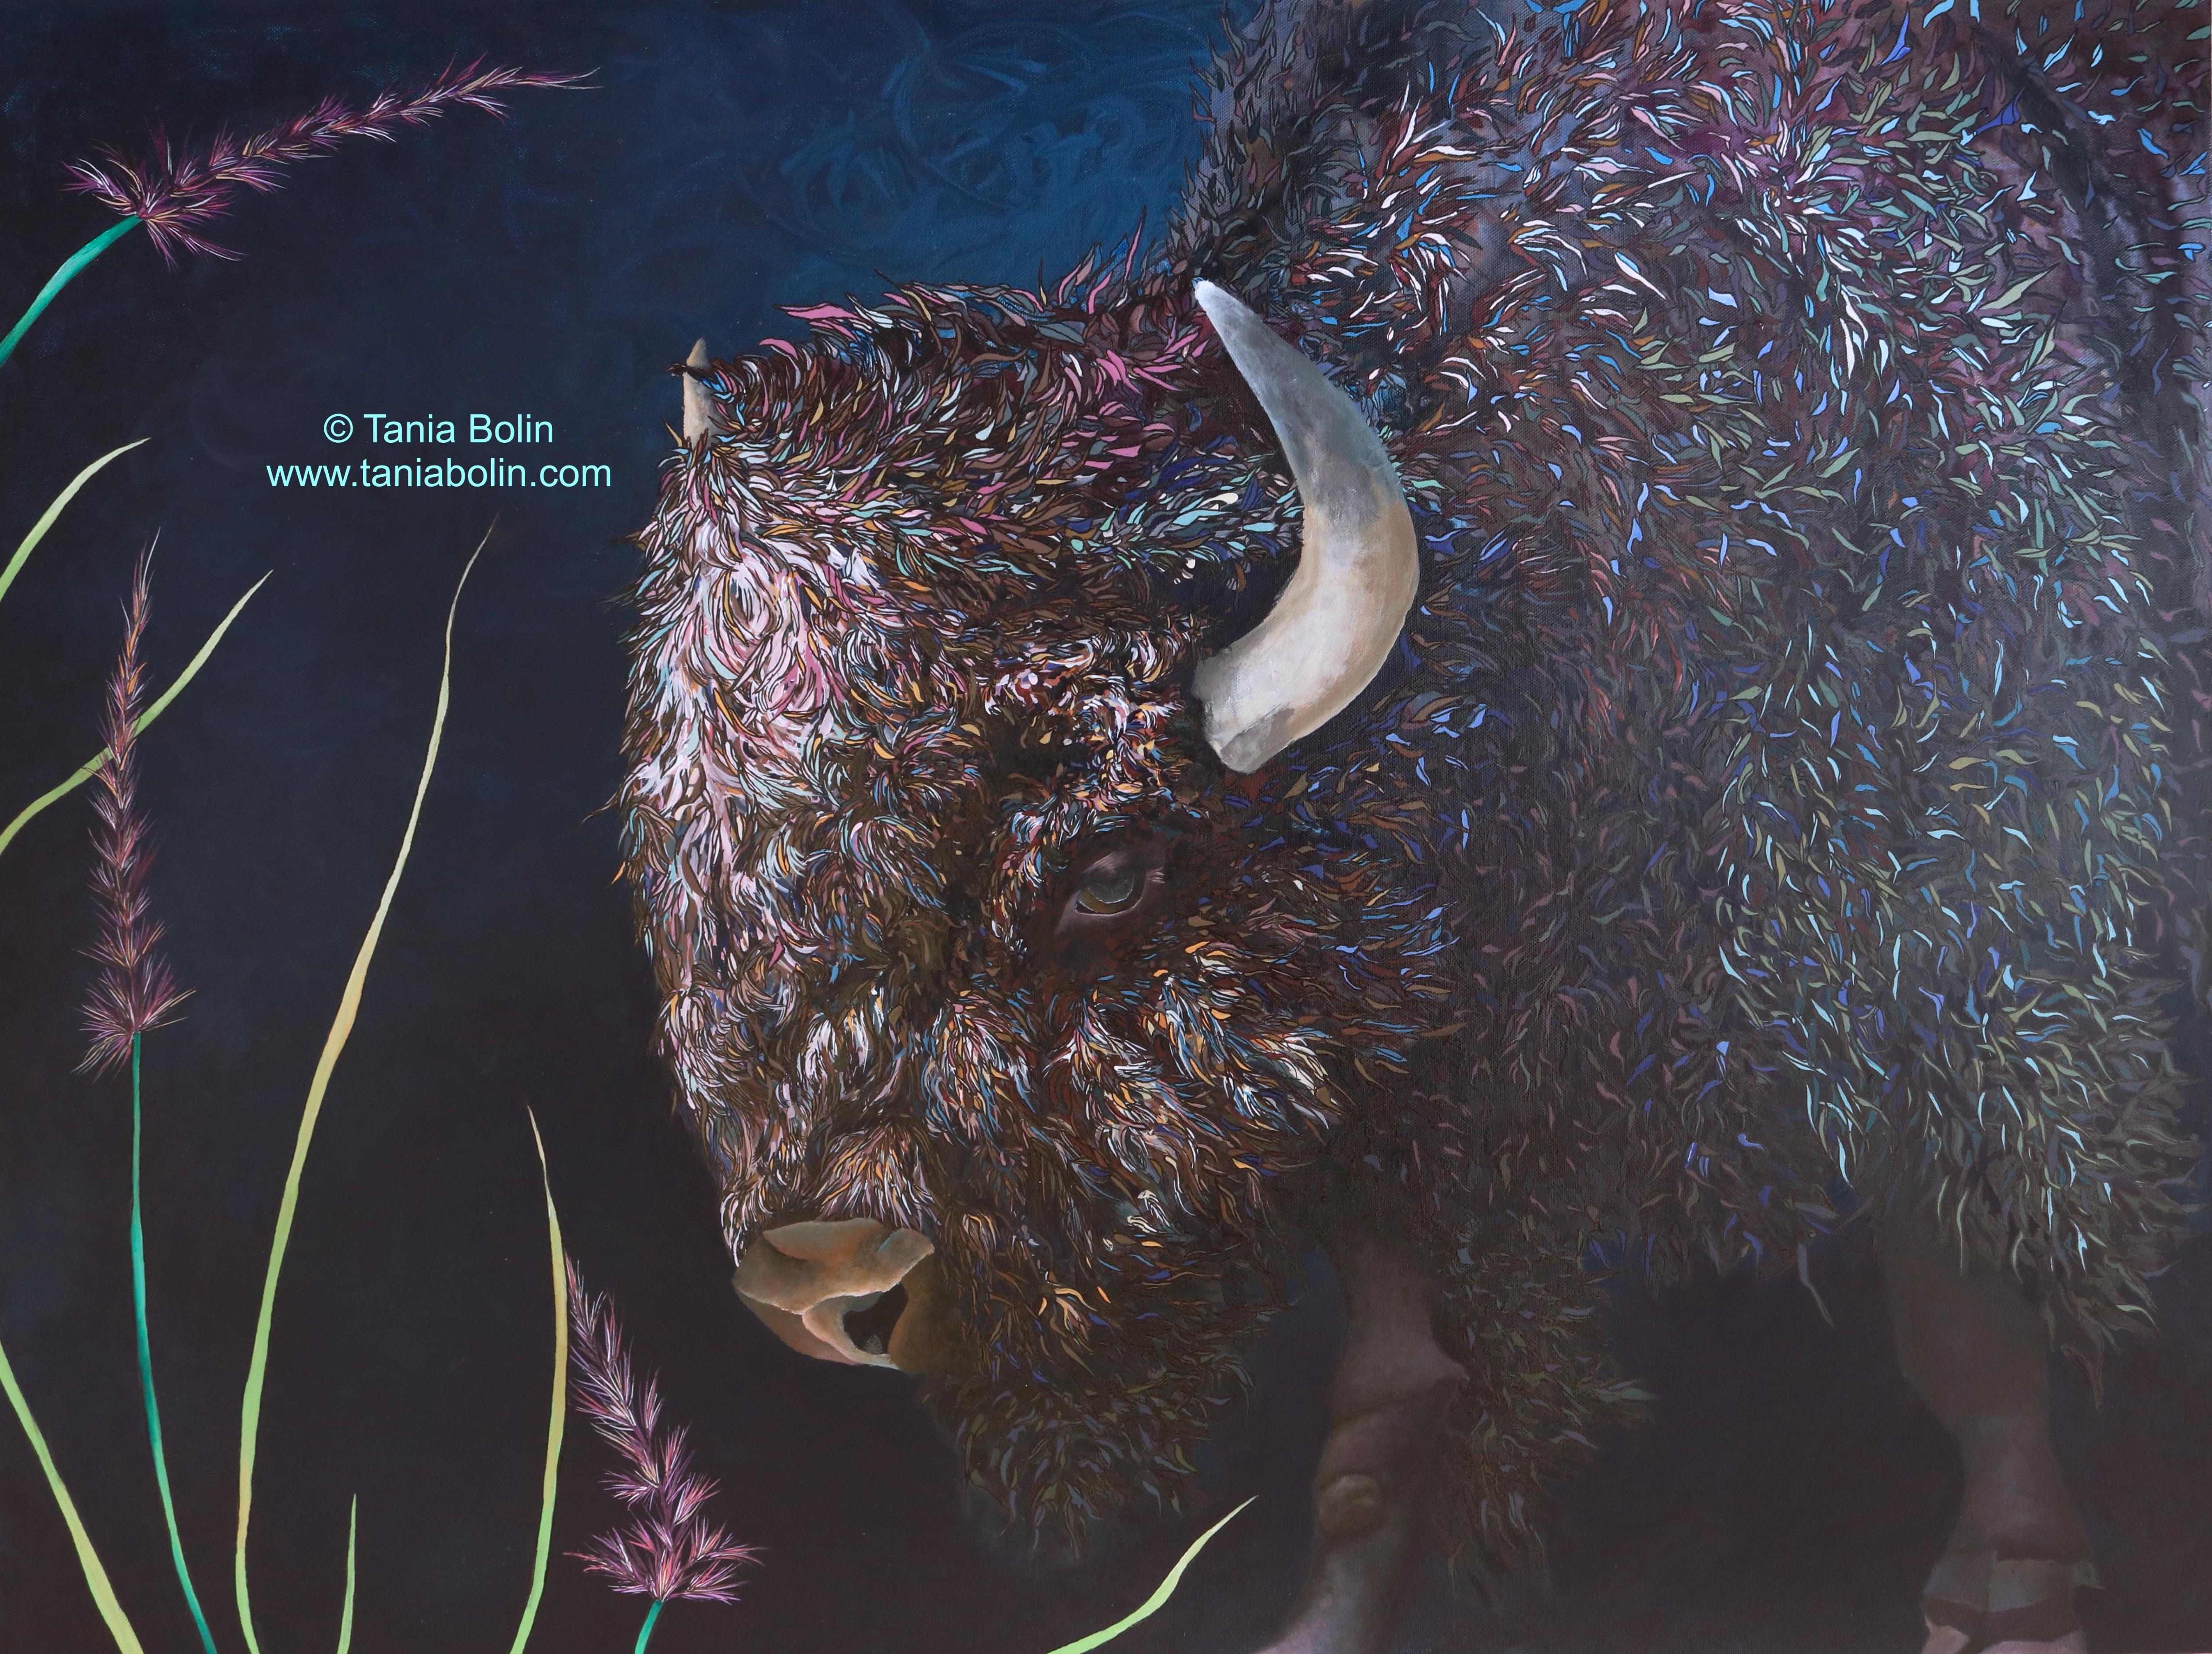 Burly Bison